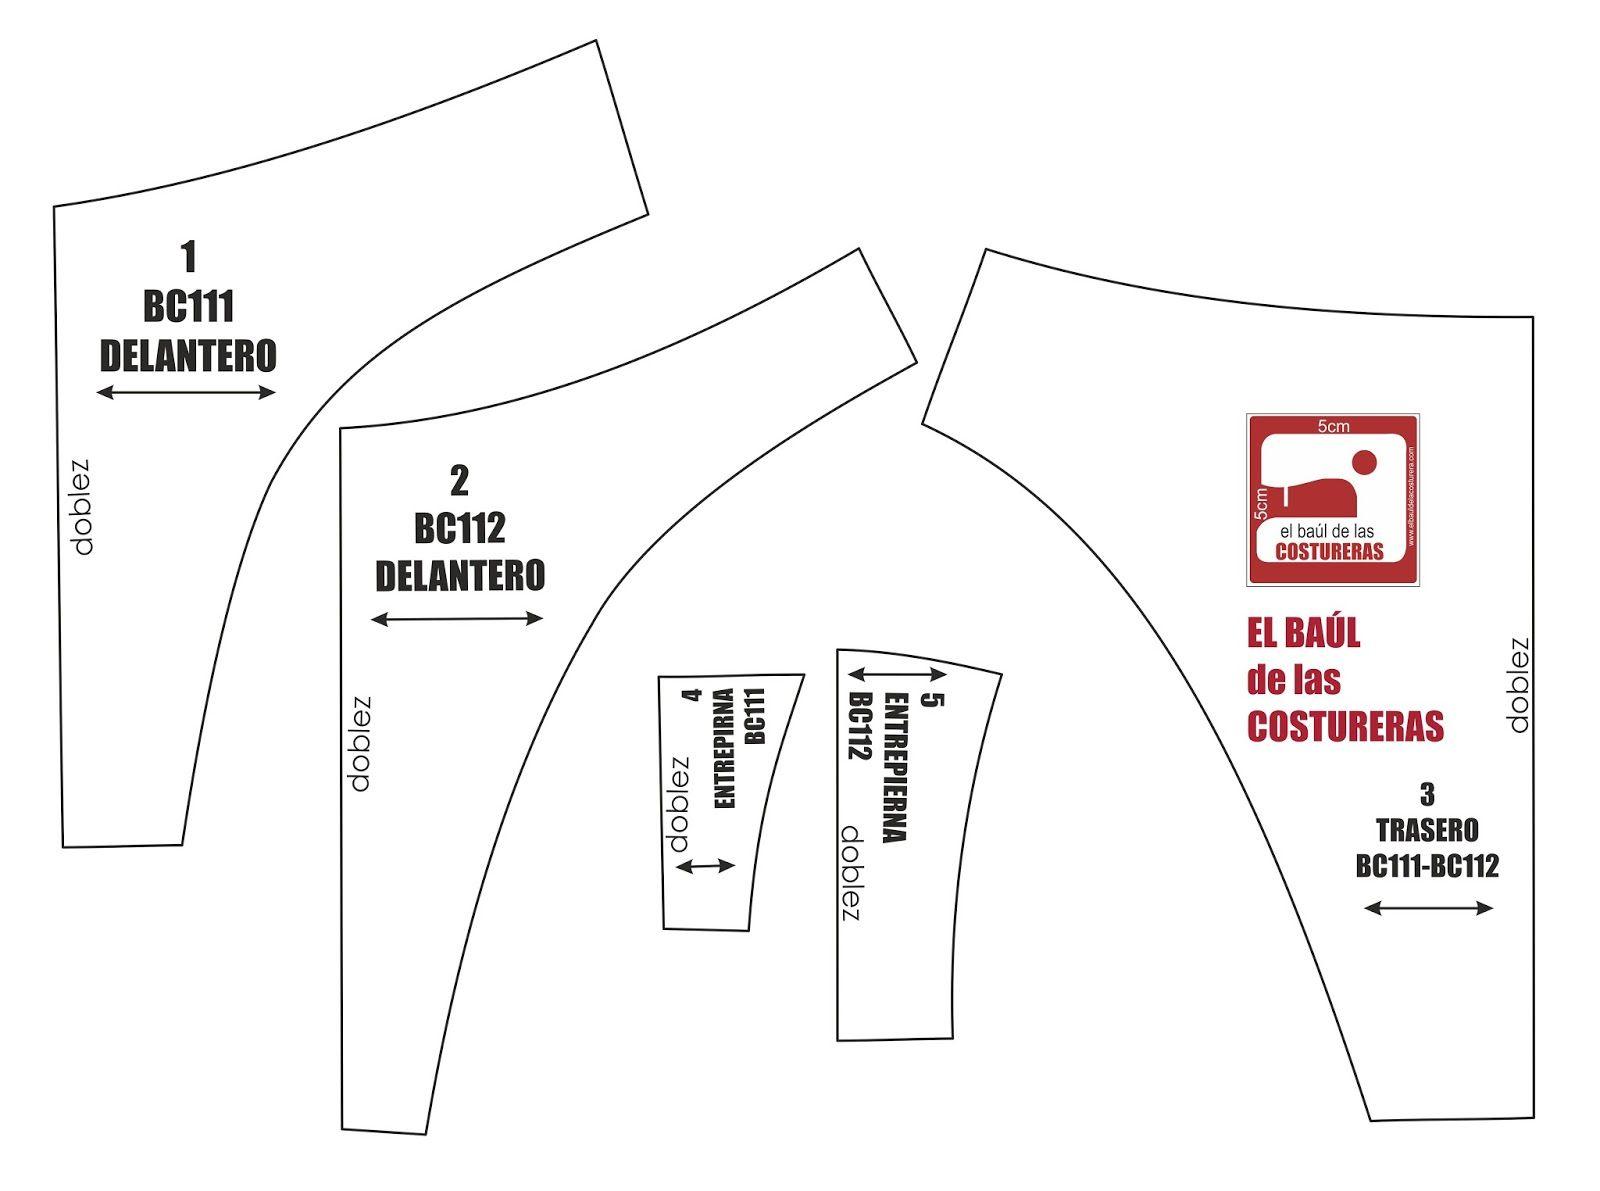 Pantaleta Bikini BC111 BC112 | Costura | Pinterest | Sewing, Sewing ...